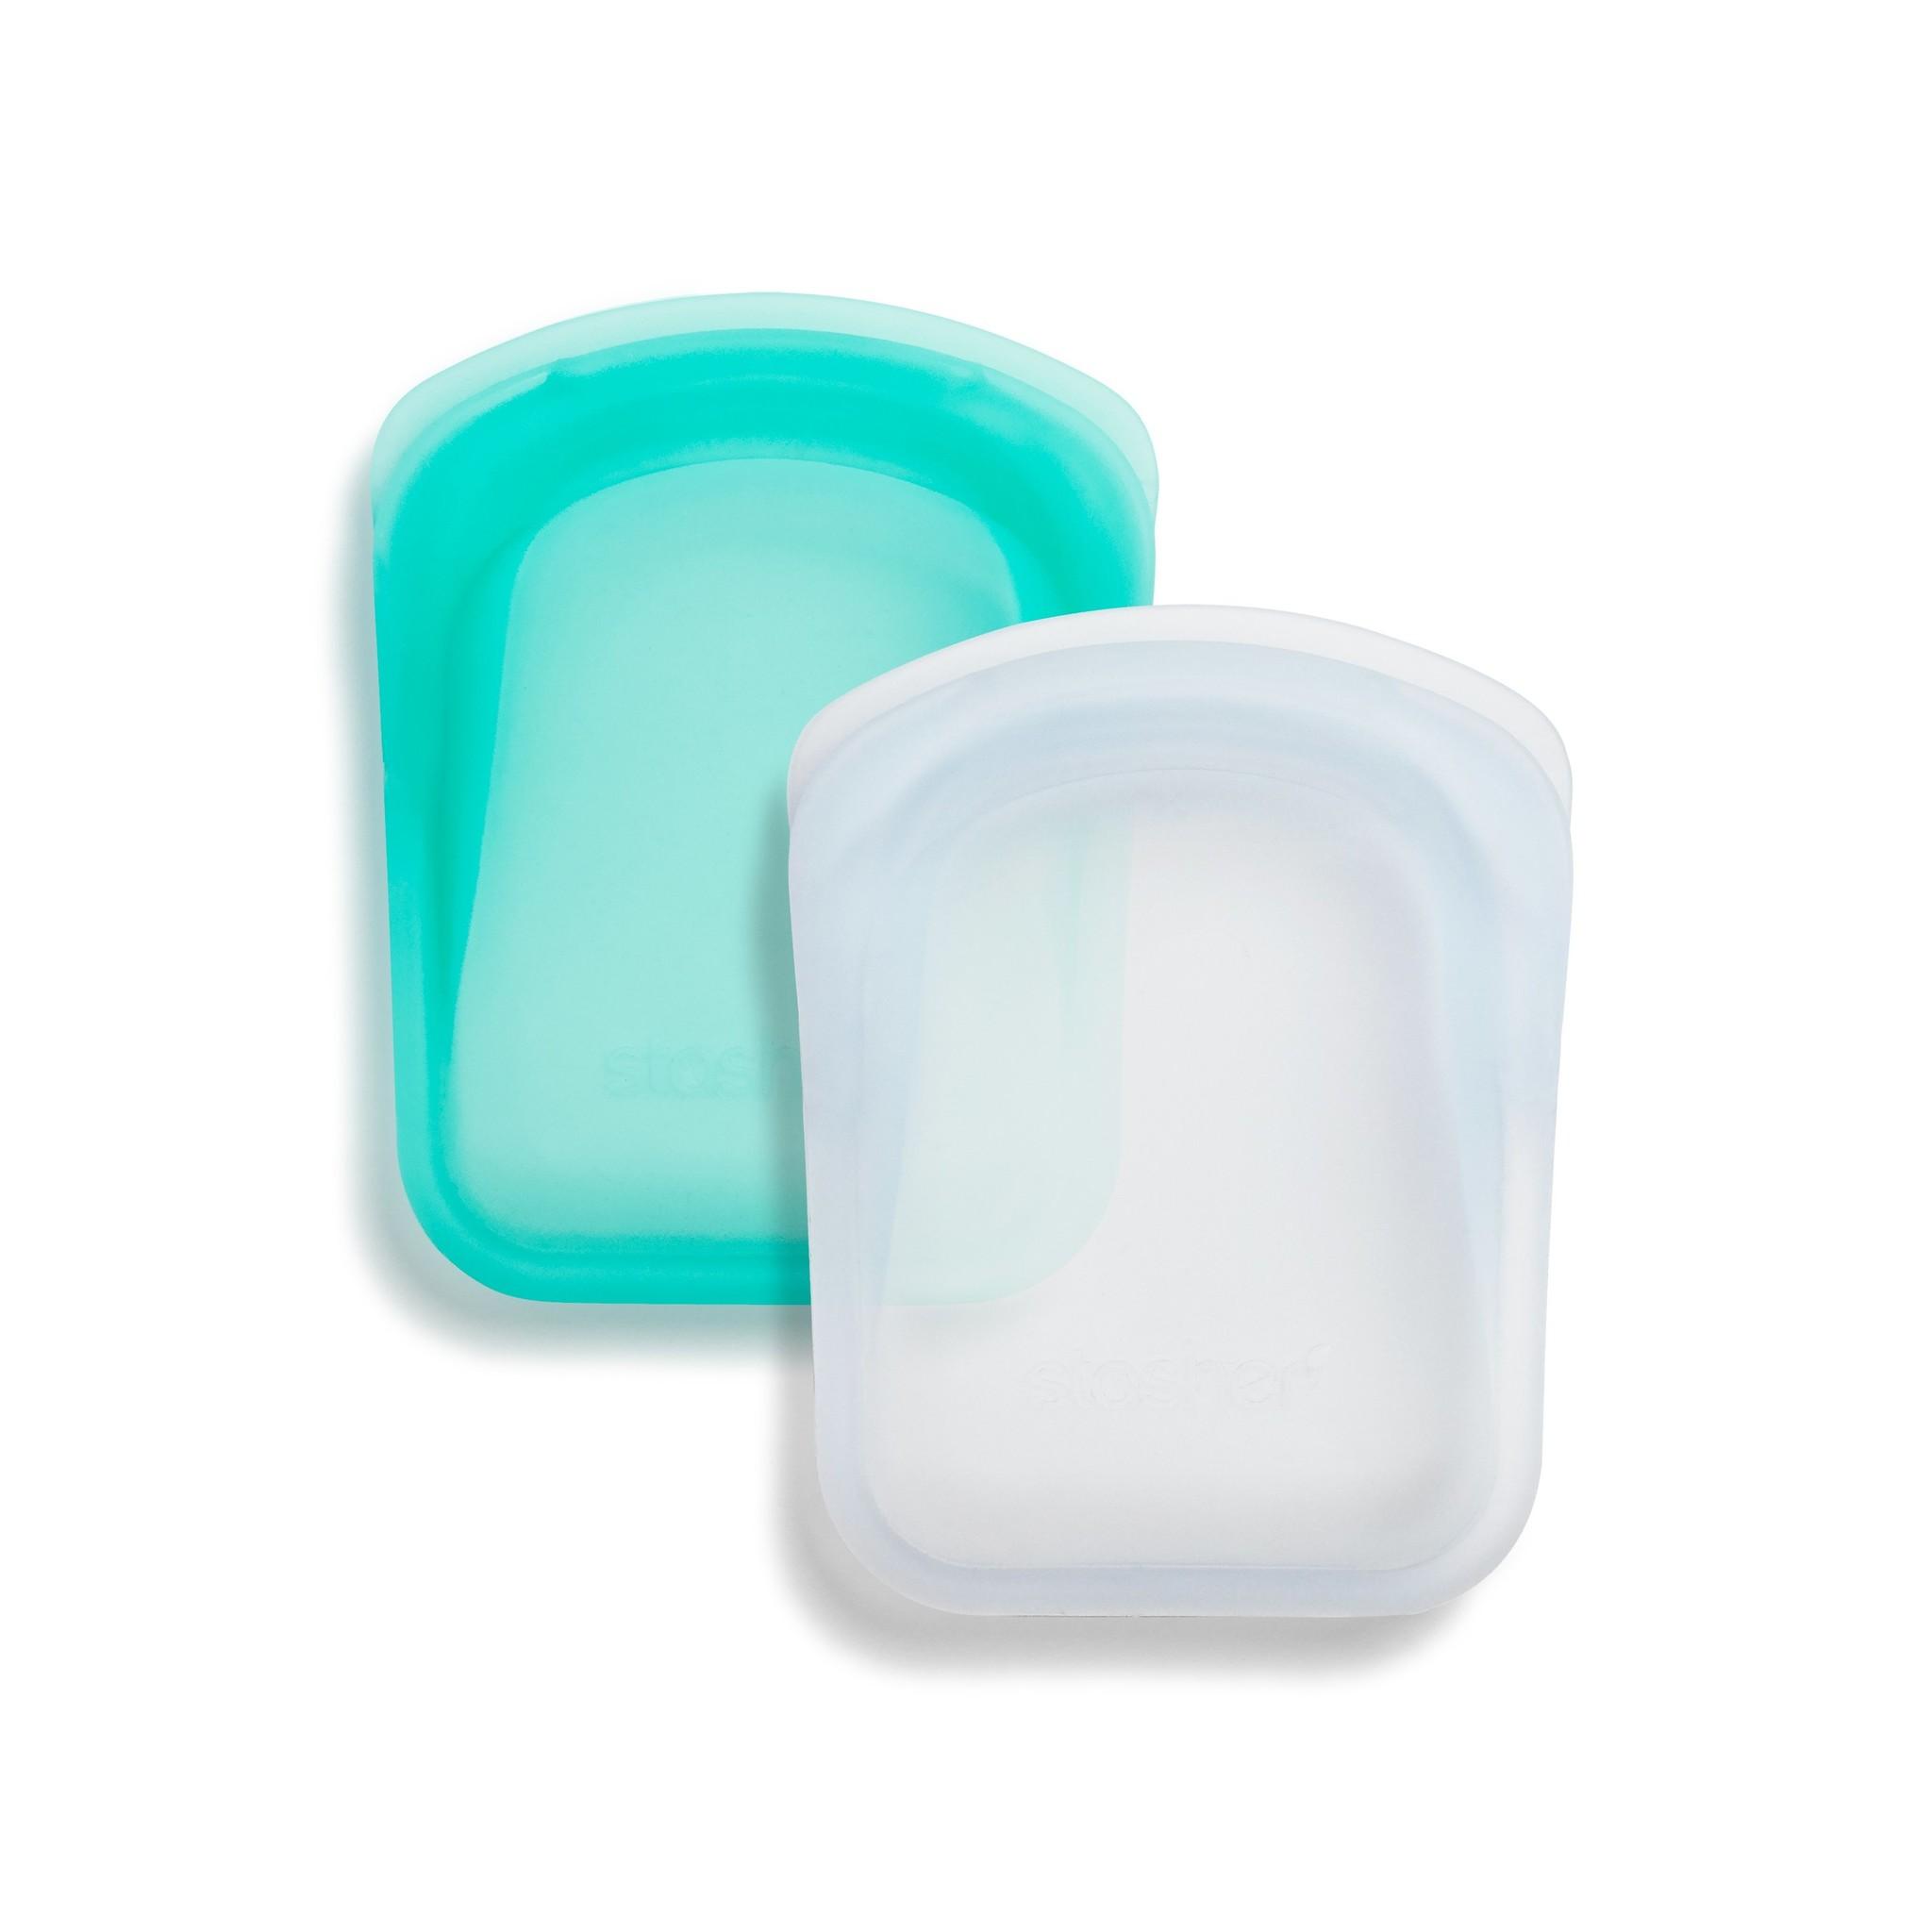 Stasher Pocket 2-Pack Storage Bag - Aqua/Clear